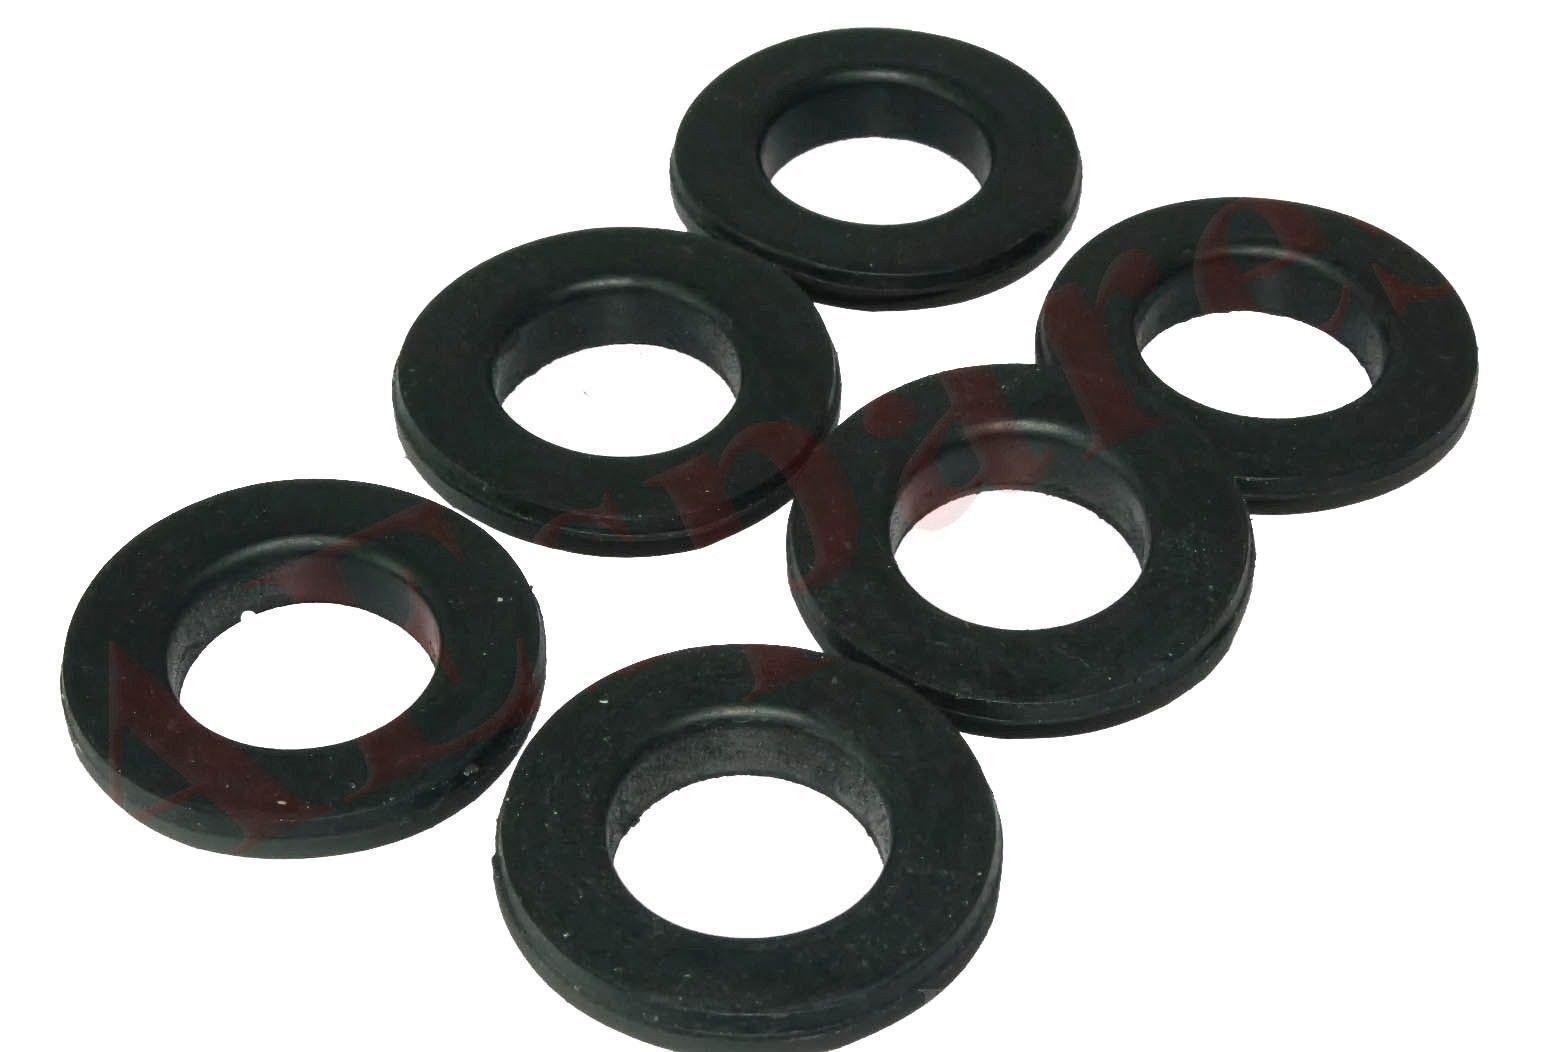 Shield Nozzle Rubber 6 Pc. Massey Ferguson 65 135 165 240 245 250 765 865 S2u